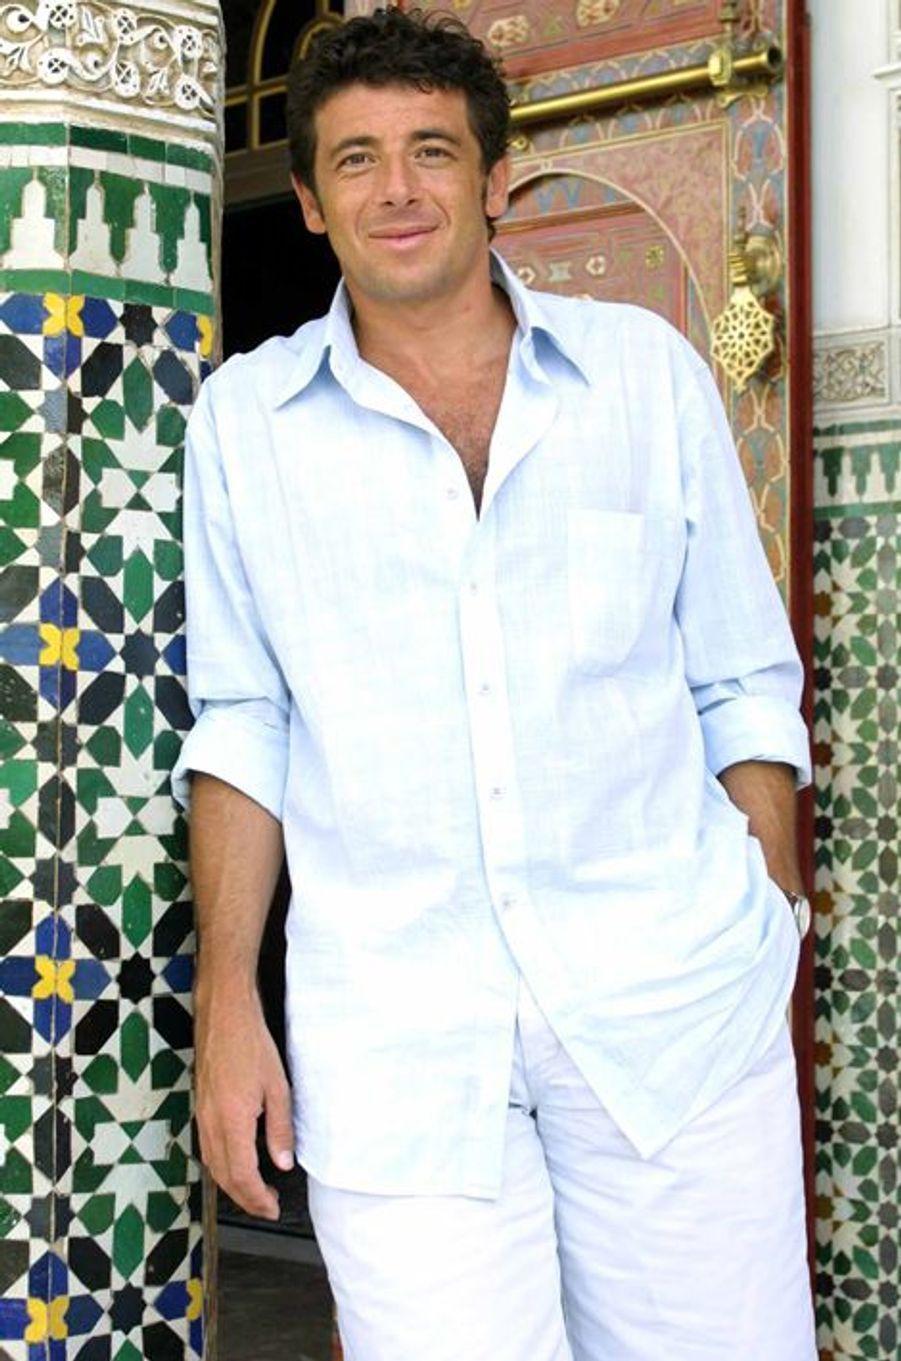 Patrick Bruel à Marrakech au Maroc le 2 octobre 2001.